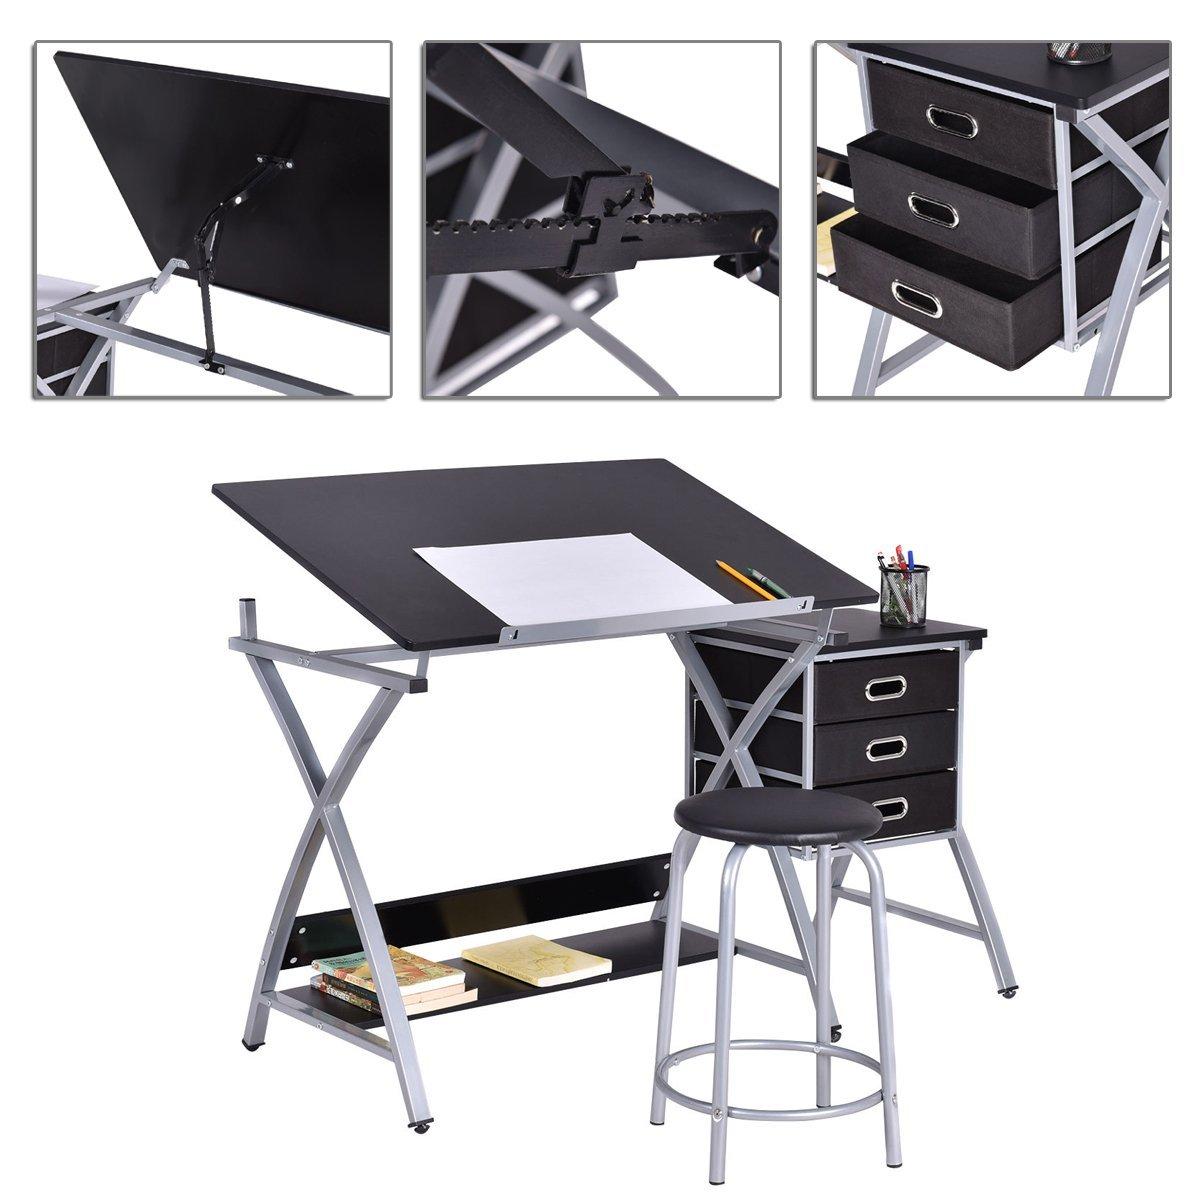 Wondrous Buy Adjustable Folding Drafting Drawing Table Desk Black Creativecarmelina Interior Chair Design Creativecarmelinacom